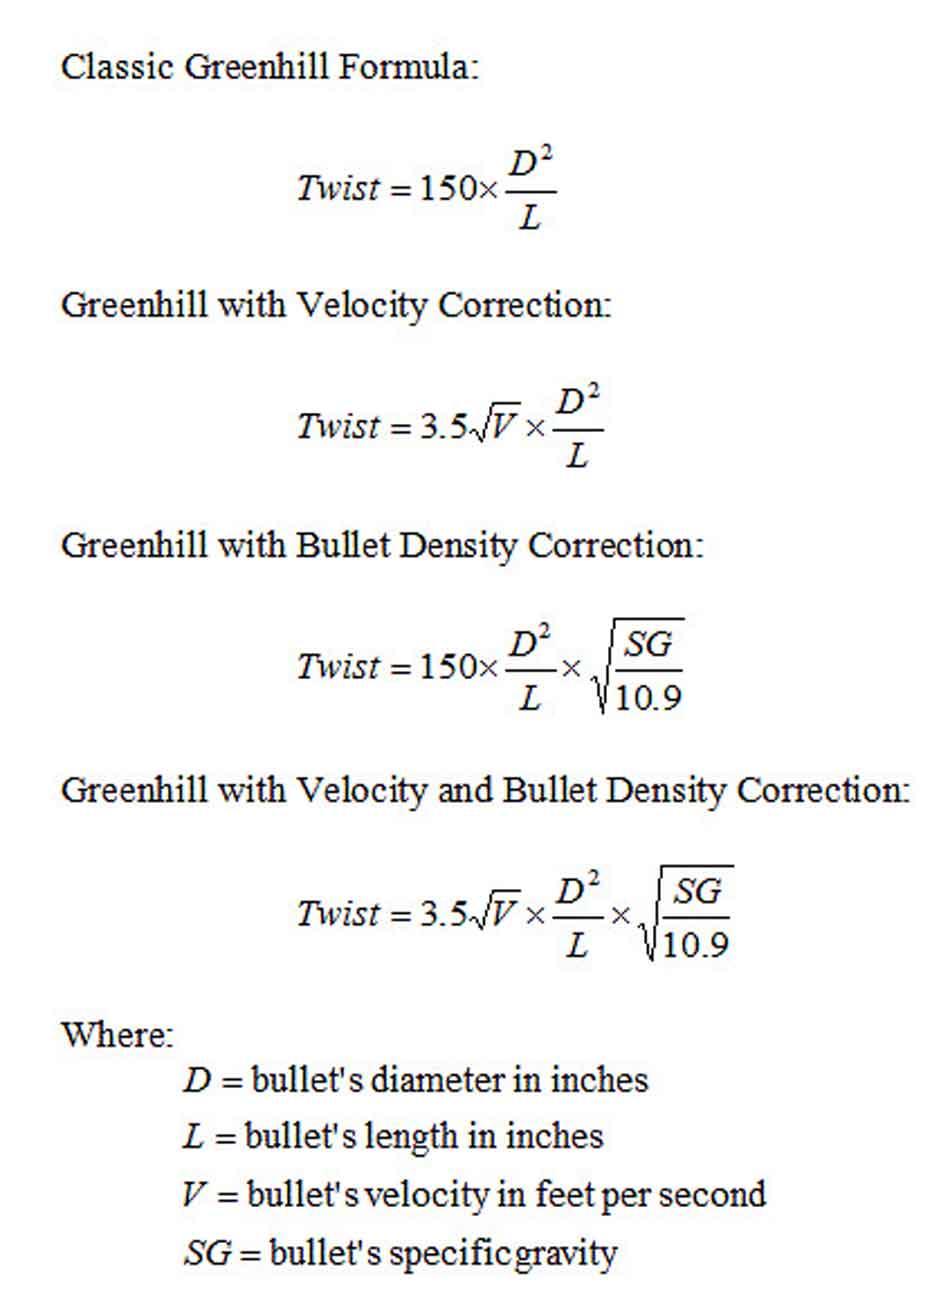 the greenhill formula